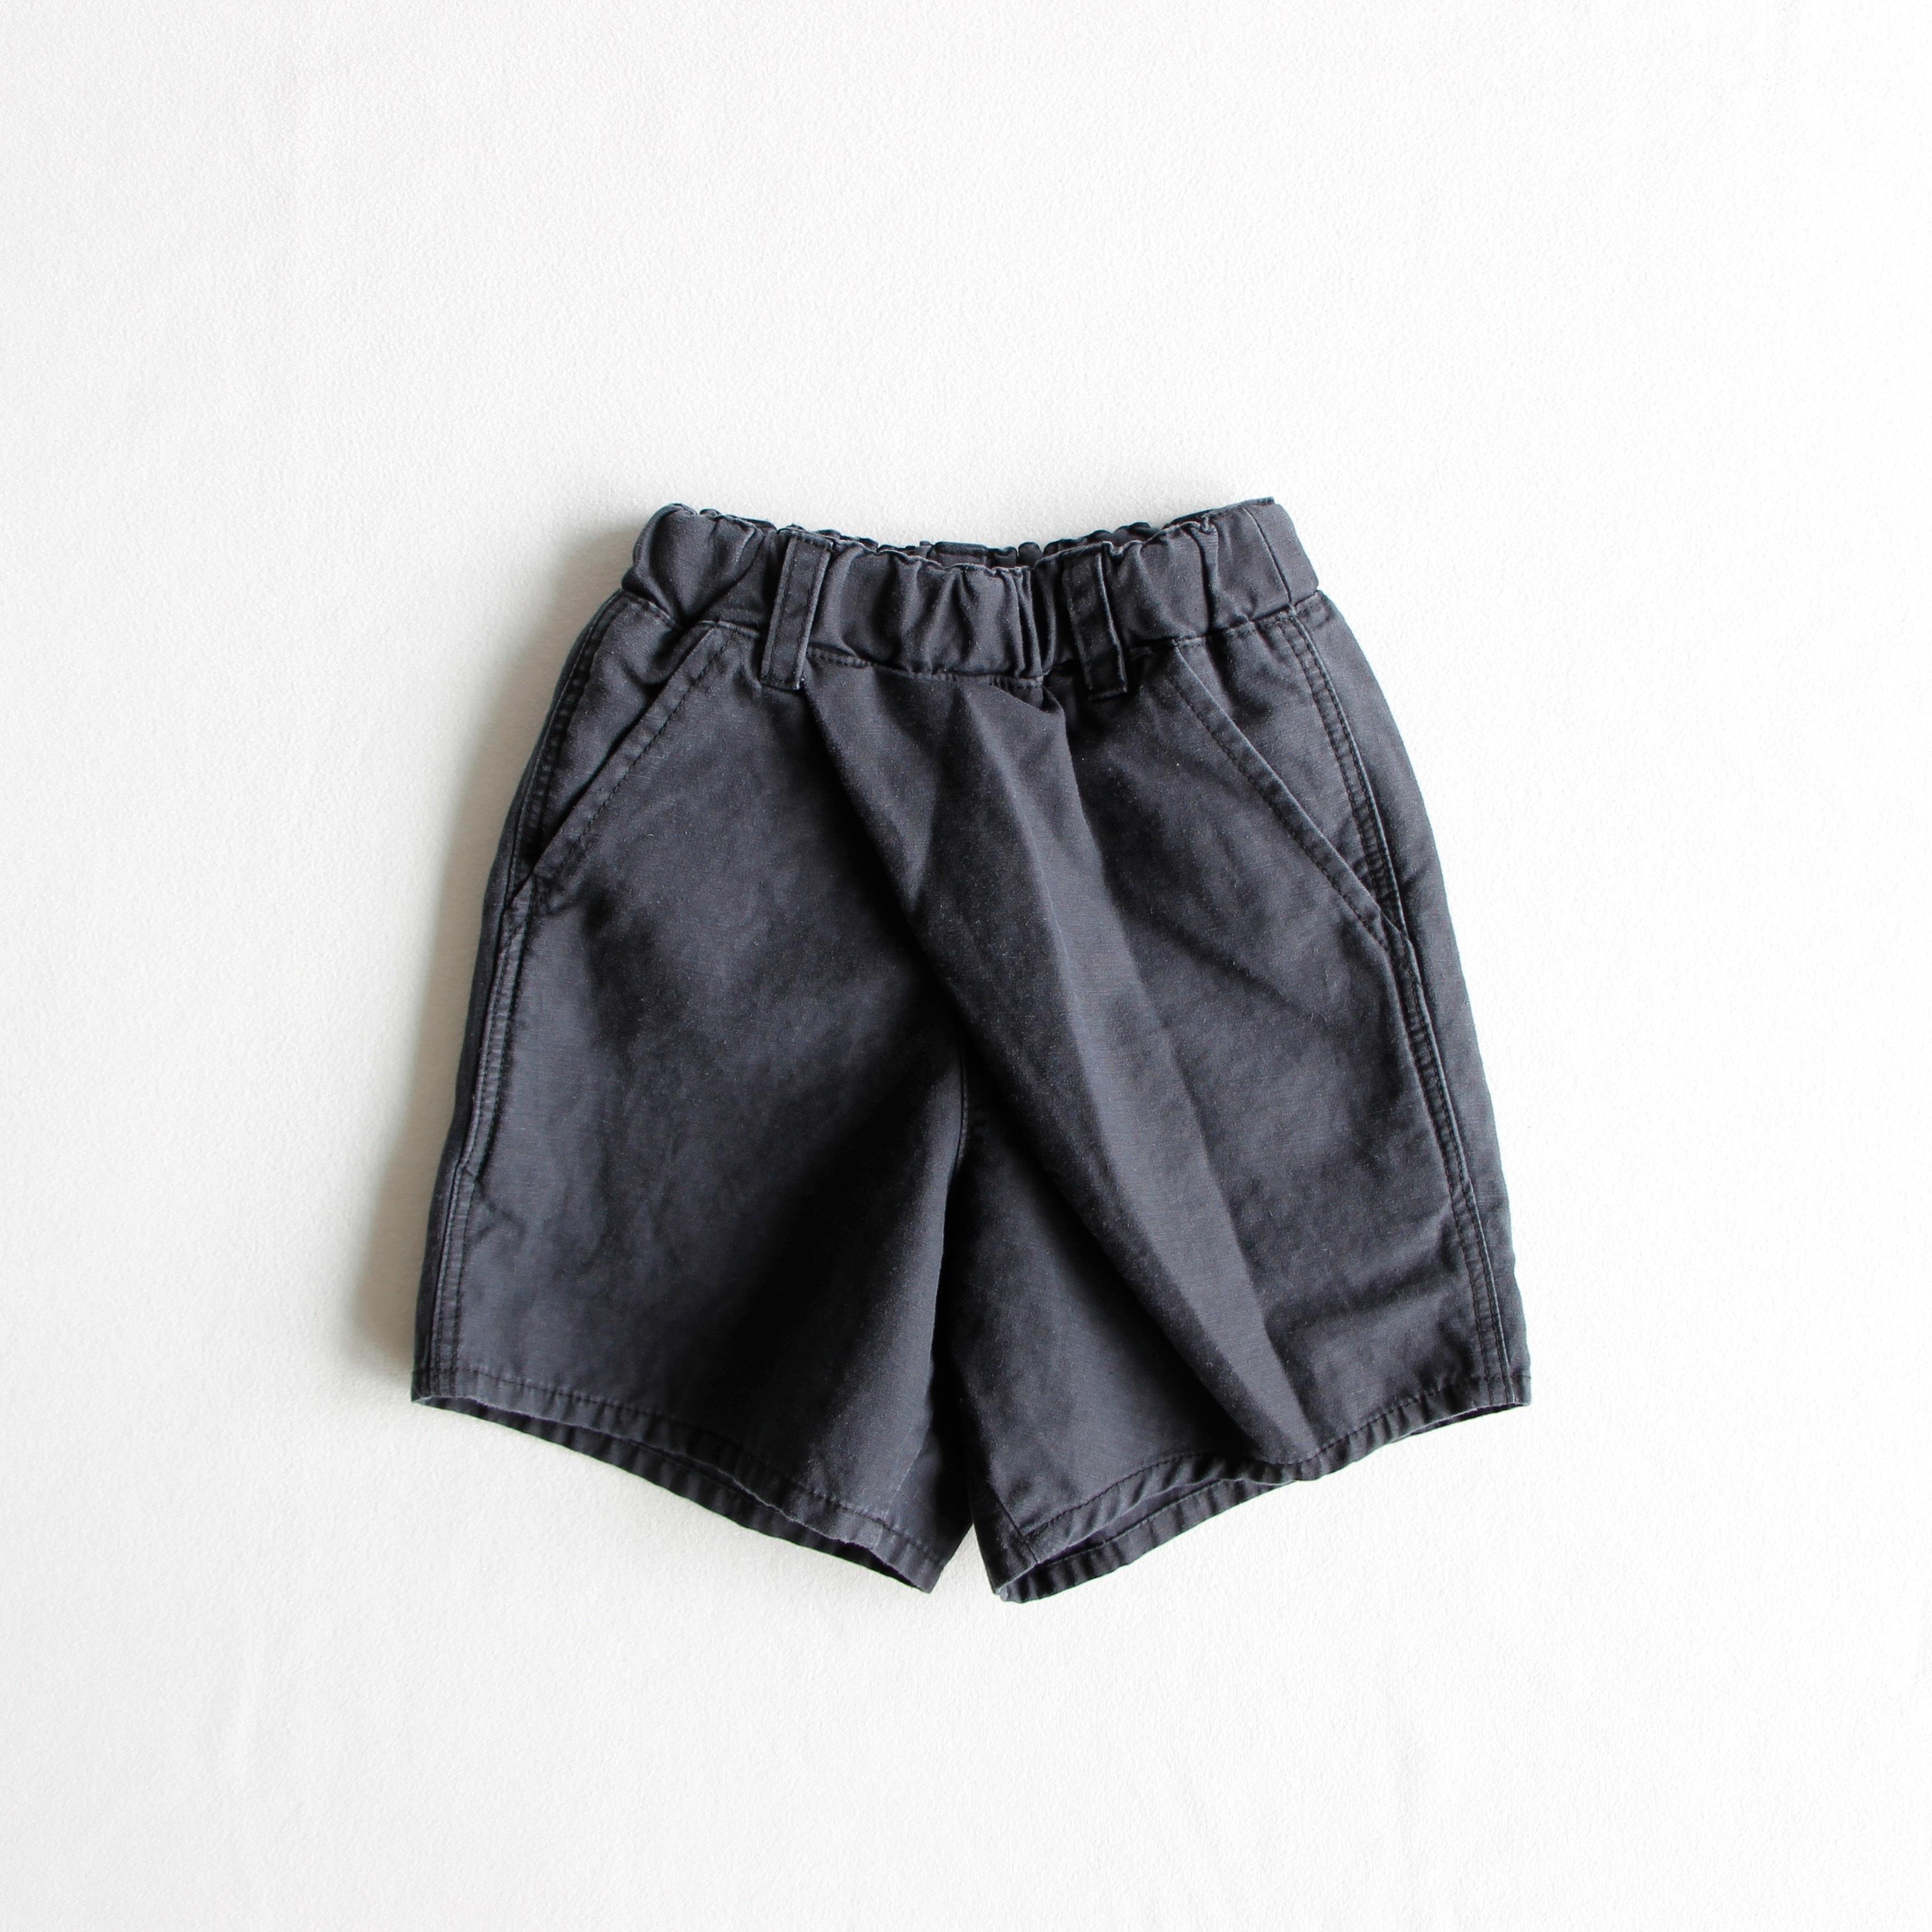 《mimi poupons 2019SS》ショートタイパンツ / black / 2・4・6Y